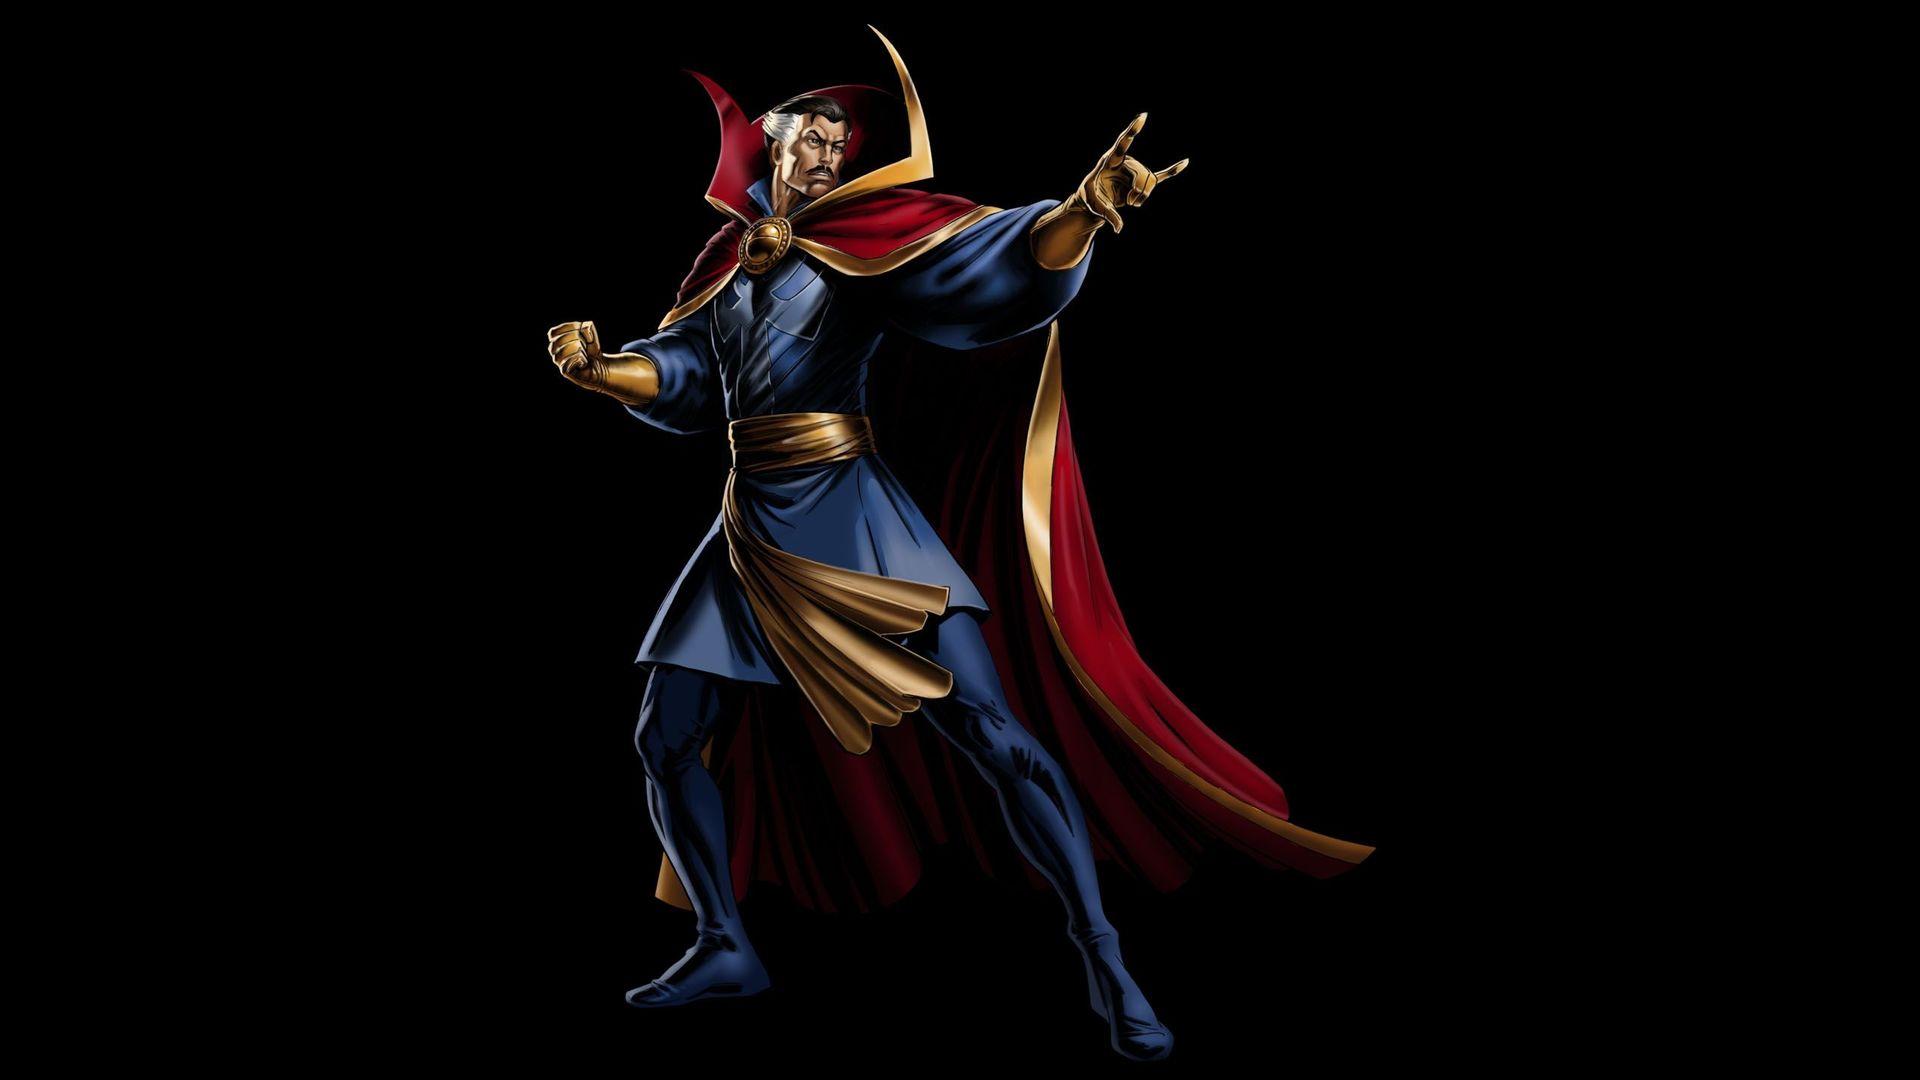 Doctor Strange Marvel Movie Wallpapers Widescreen Cinema: Pics Of Doctor Strange Wallpaper